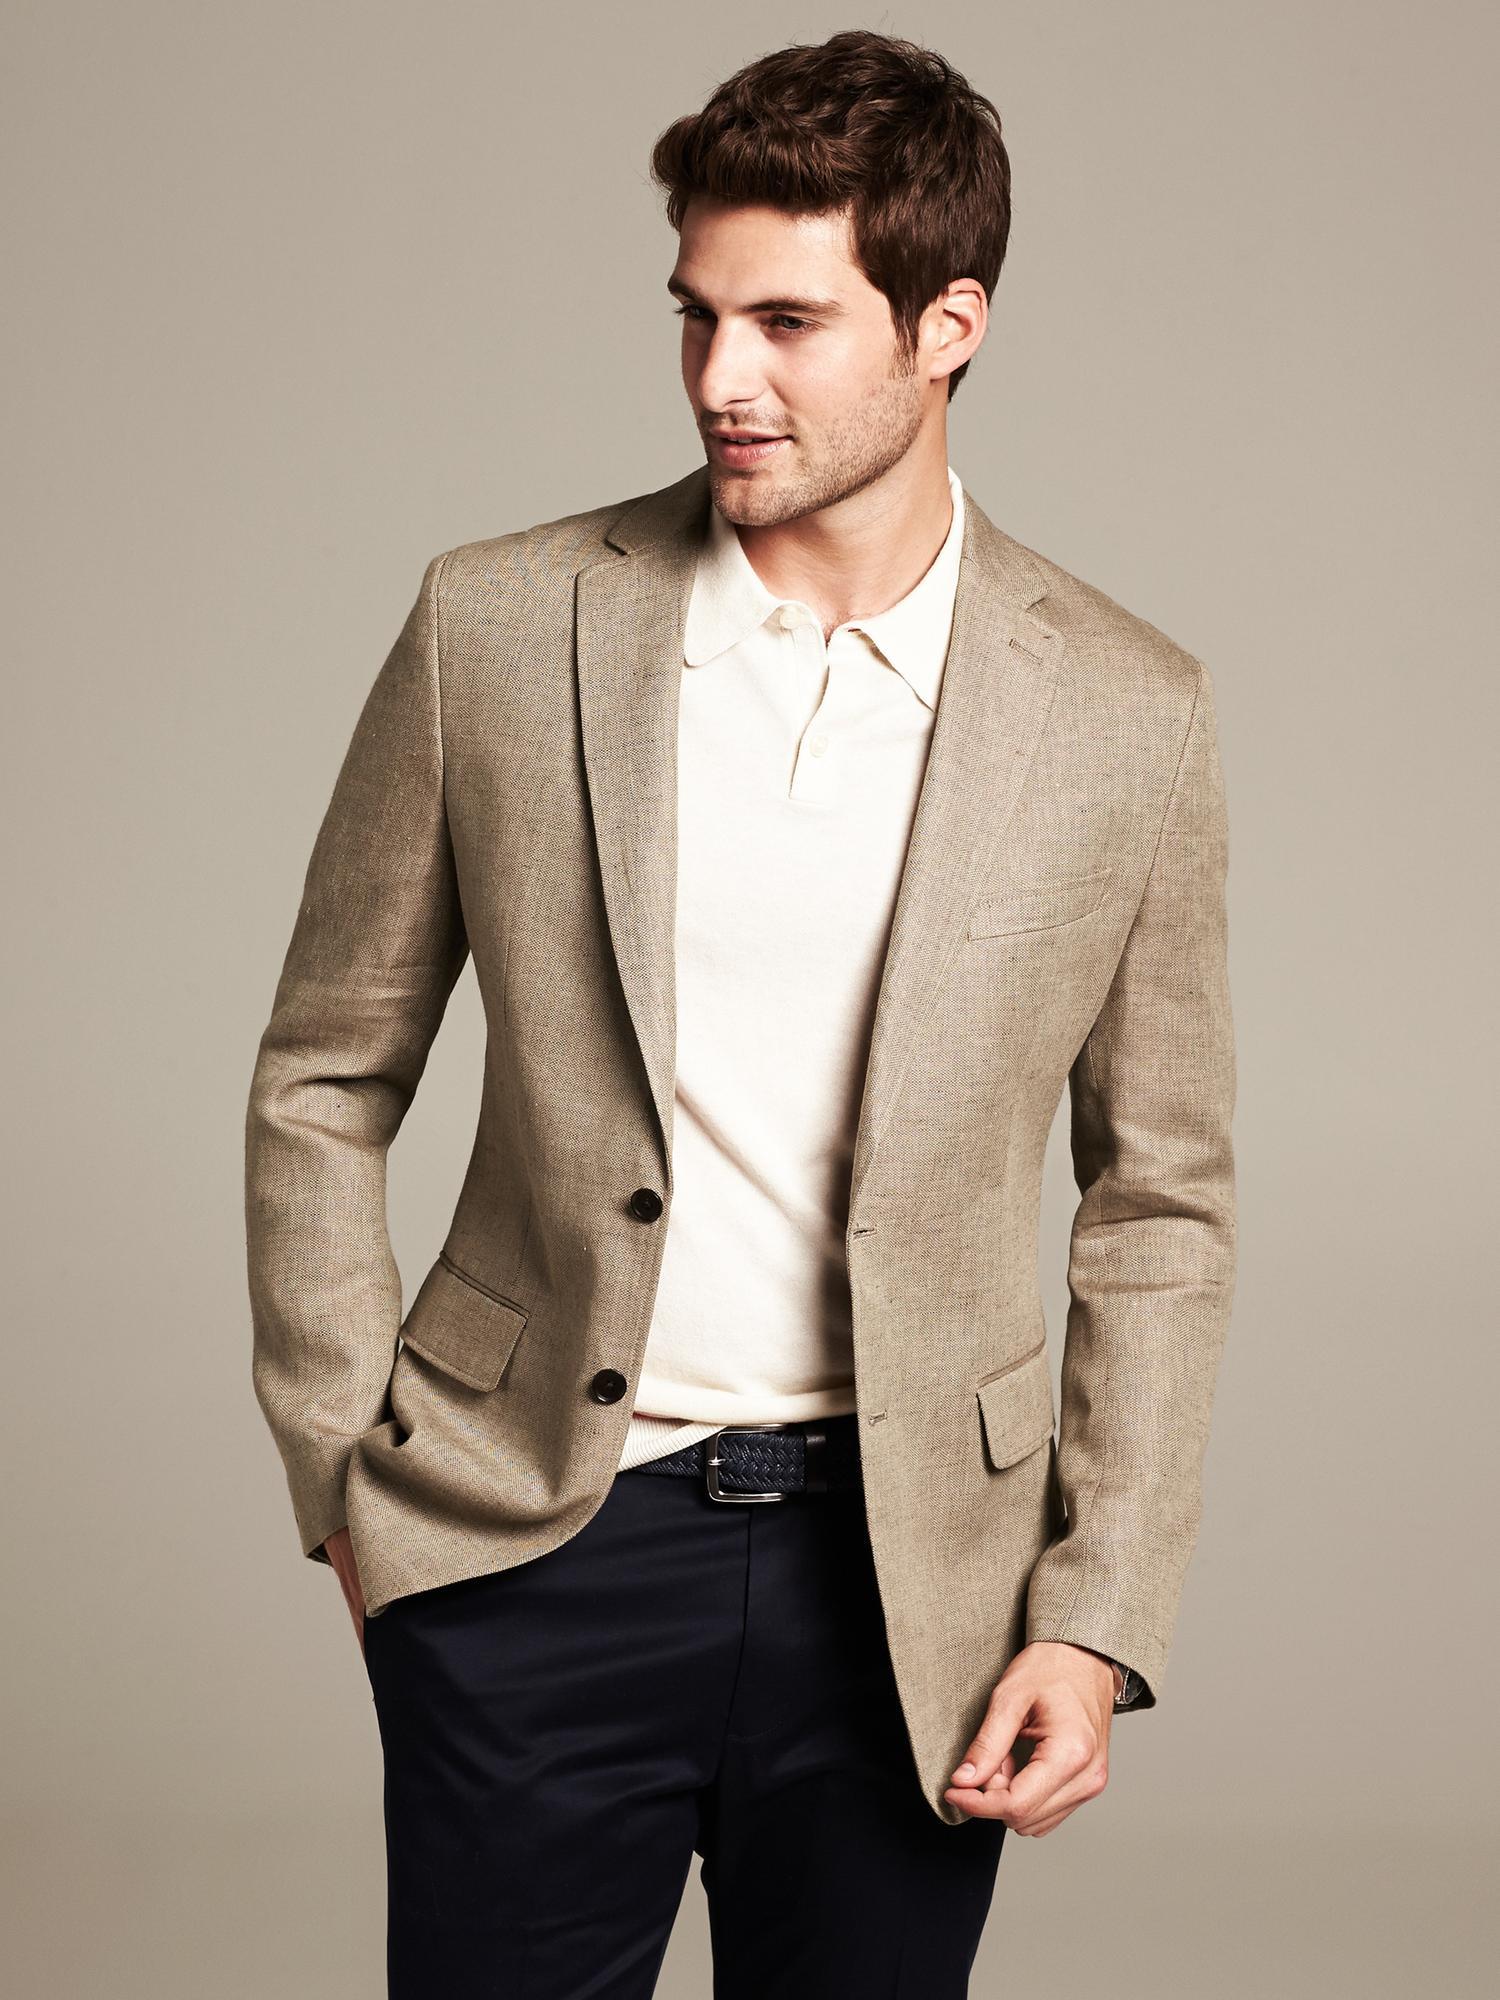 Blazers For Men Pinterest: Banana Republic Tailored-Fit Khaki Linen Blazer In